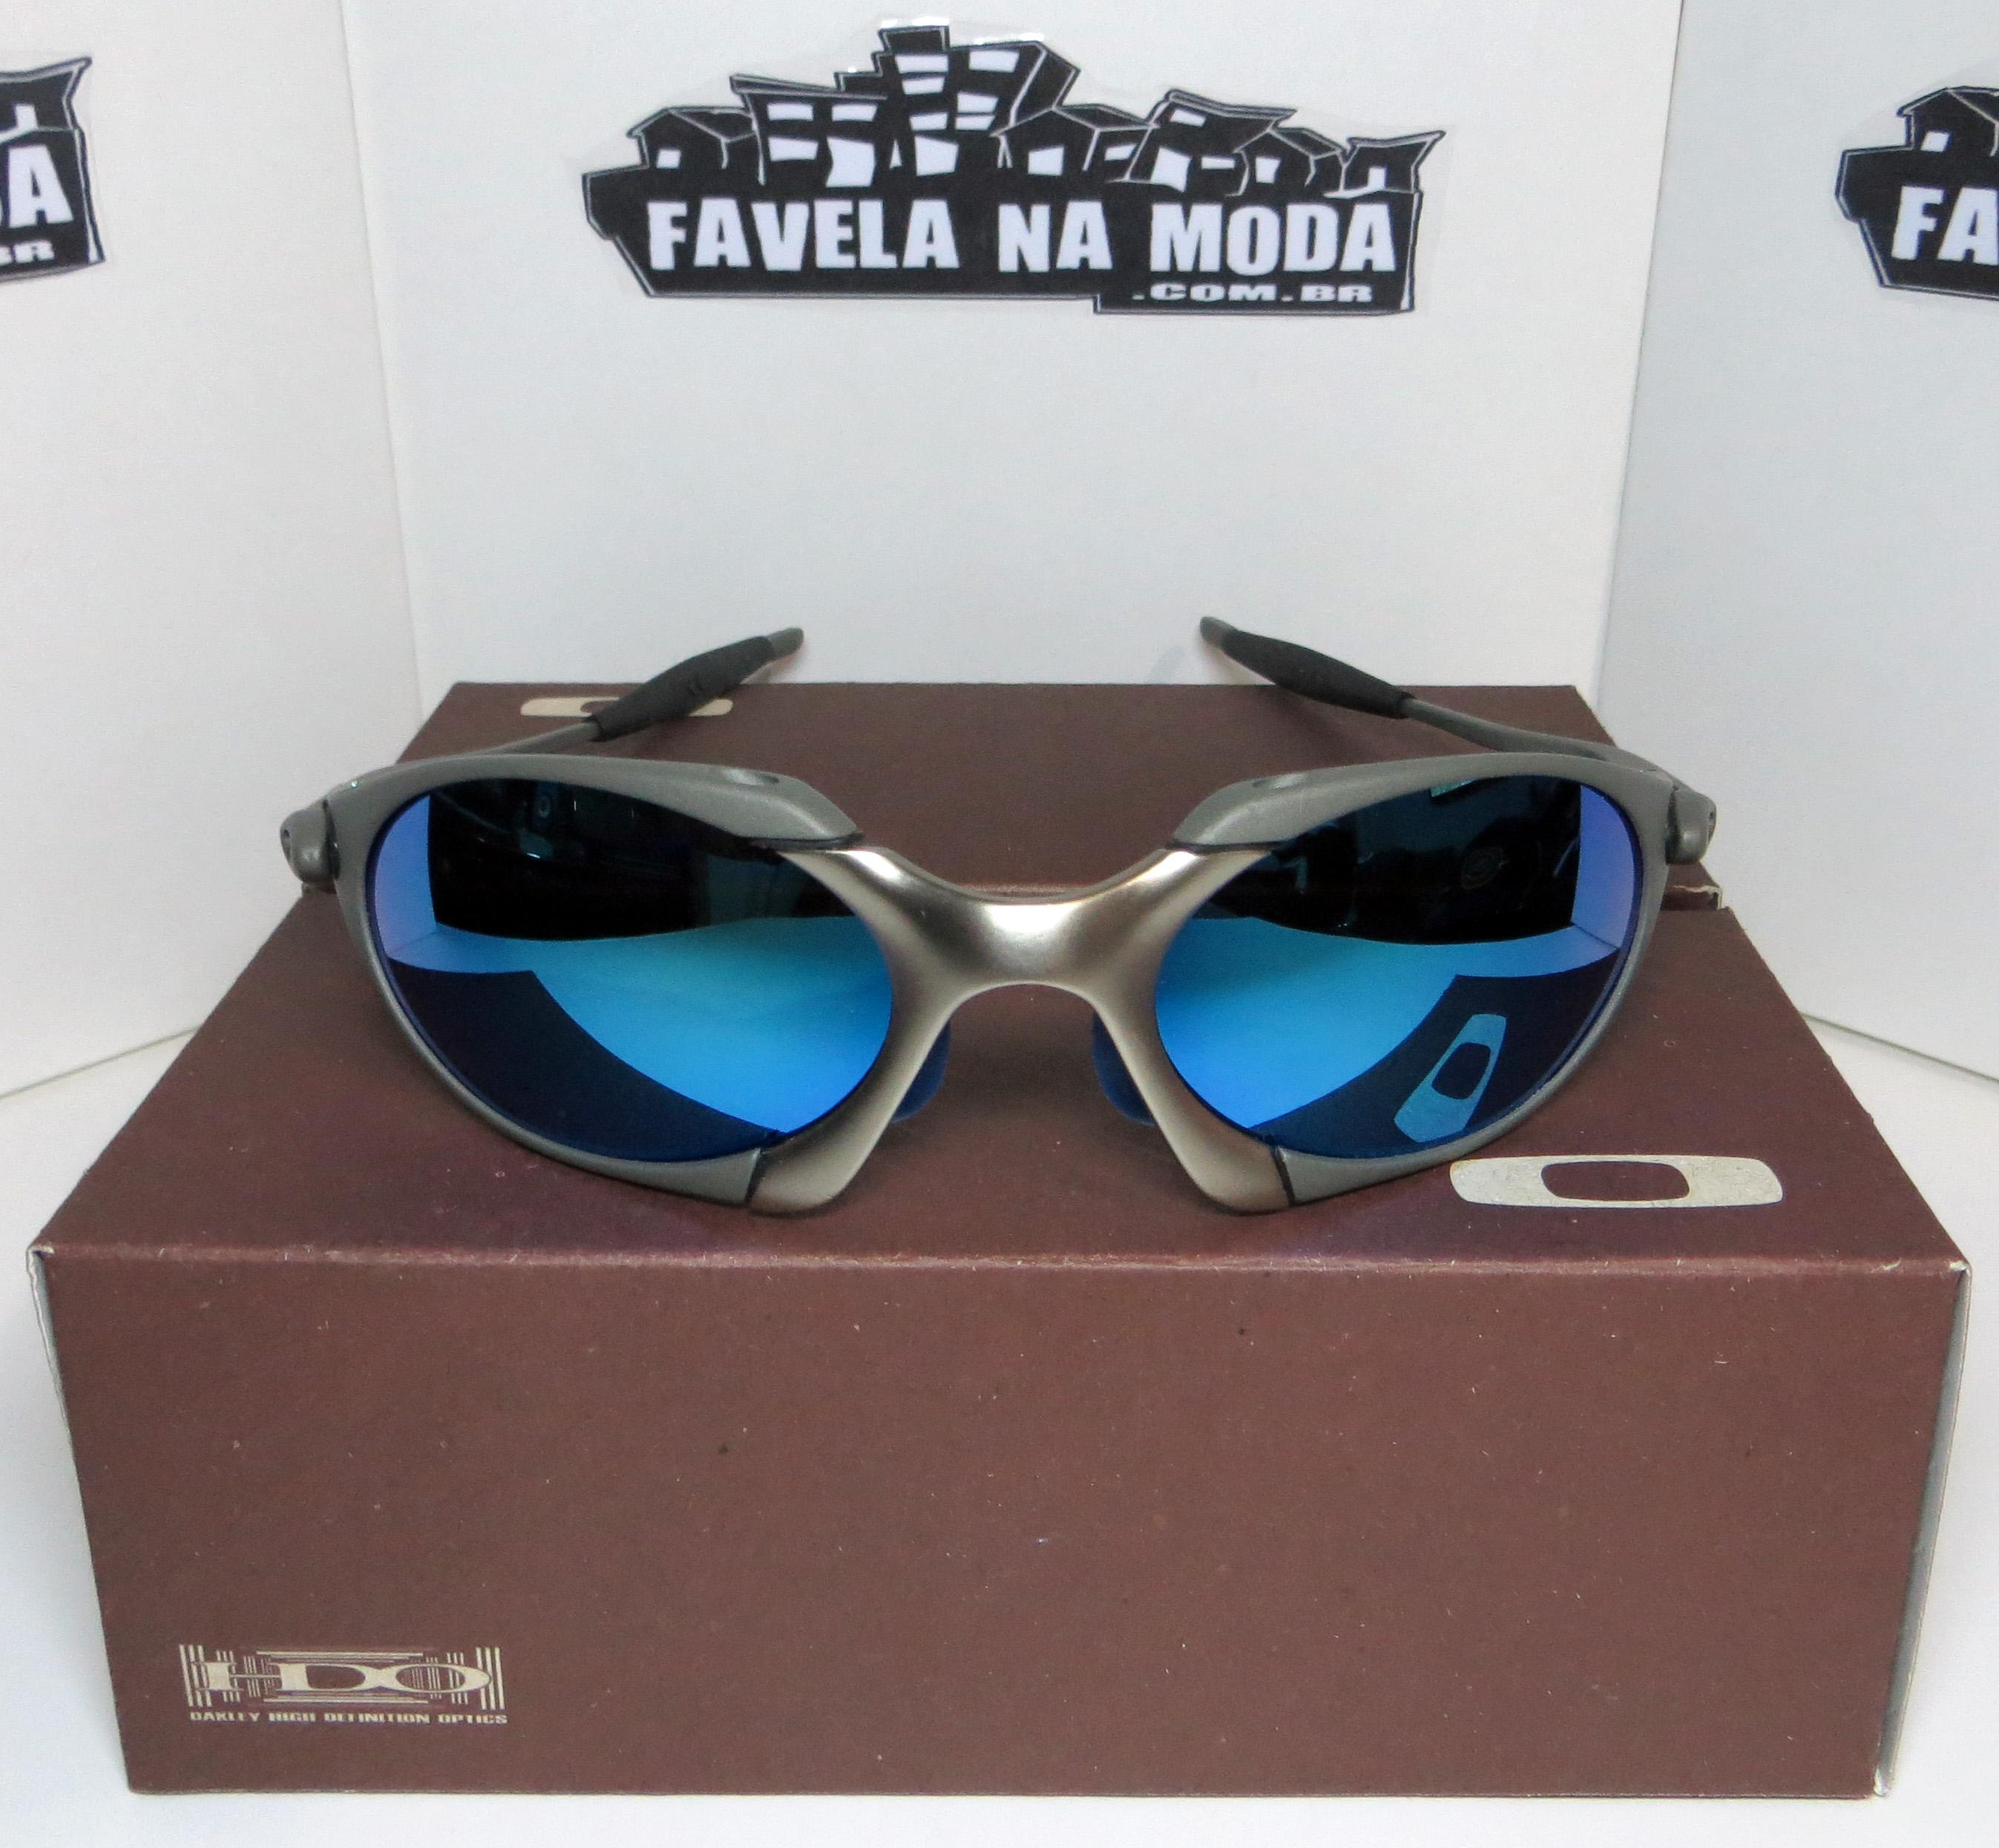 ca43617b6 Óculos Oakley Romeo 1 - Tio 2 - X-Metal e Plasma / Ice Thug / Borrachinhas  Pretas